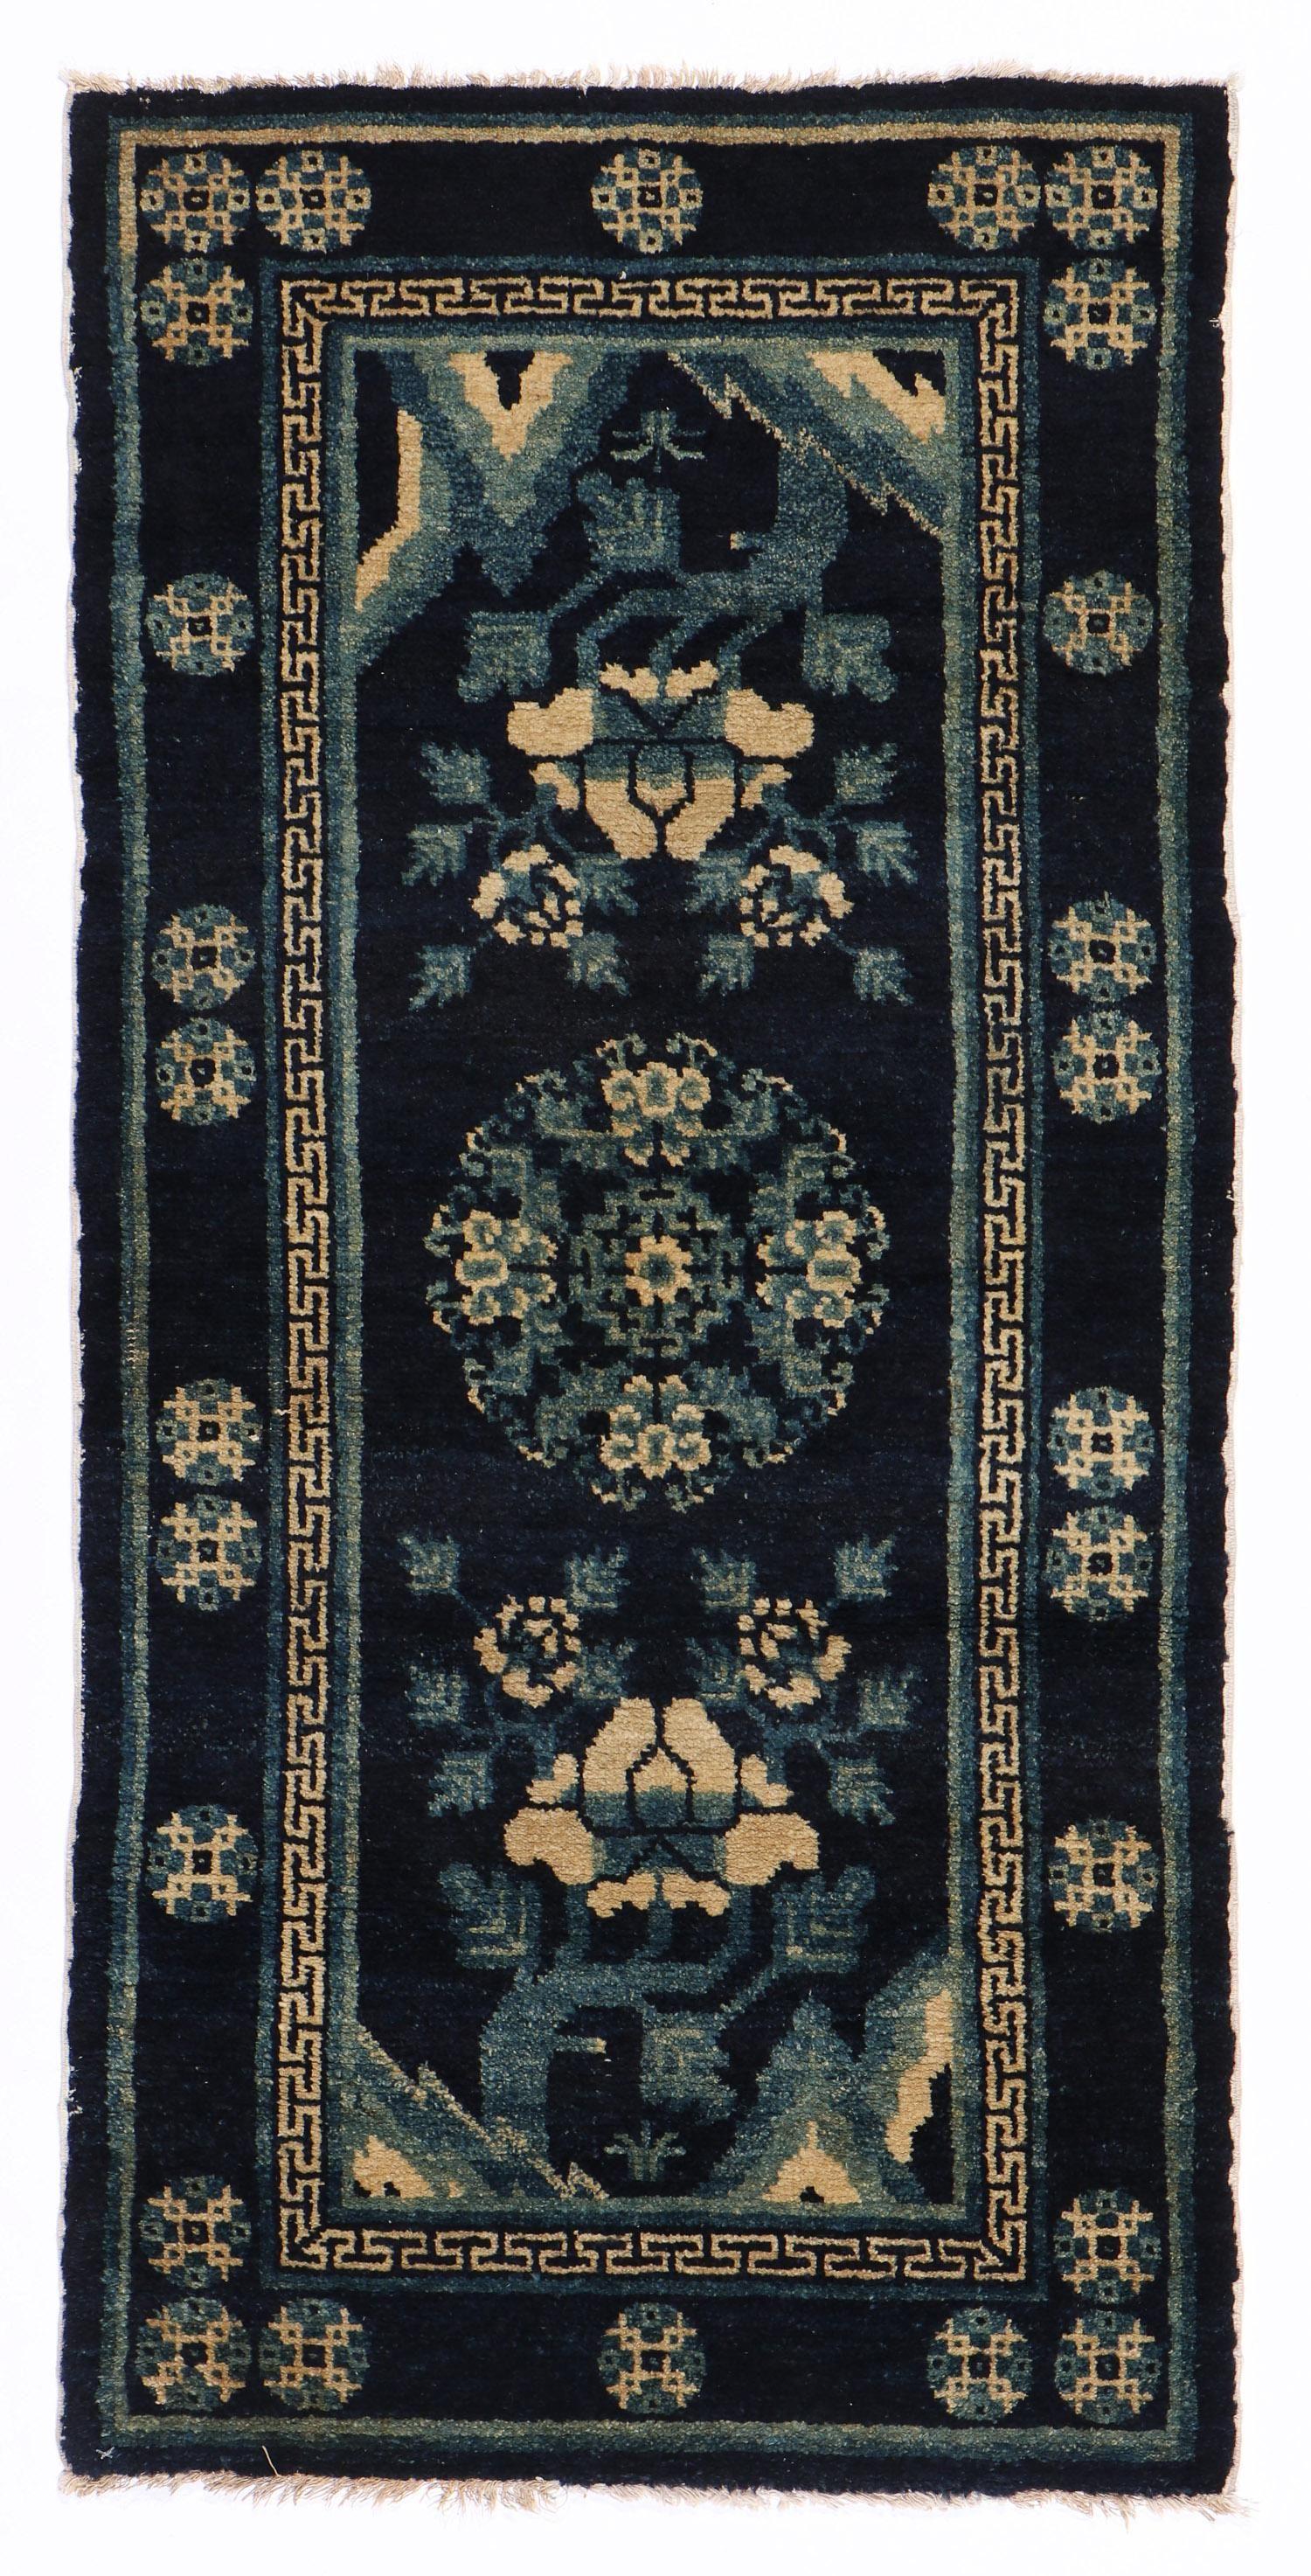 Batou Rug, Inner Mongolia, Circa 1900, 2'1'' x 4'4''